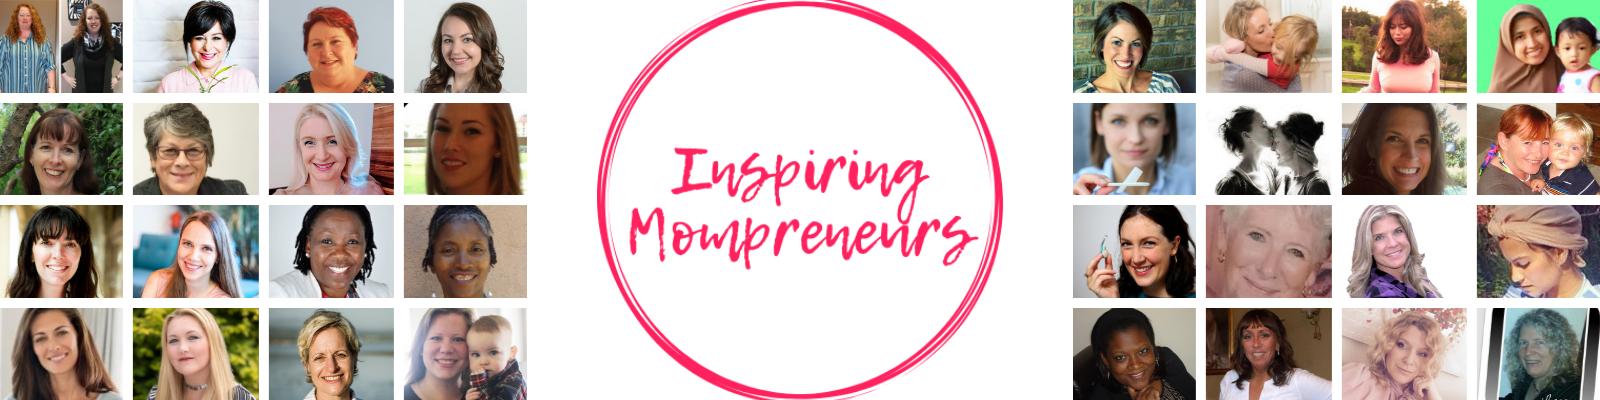 Inspiring Mompreneurs